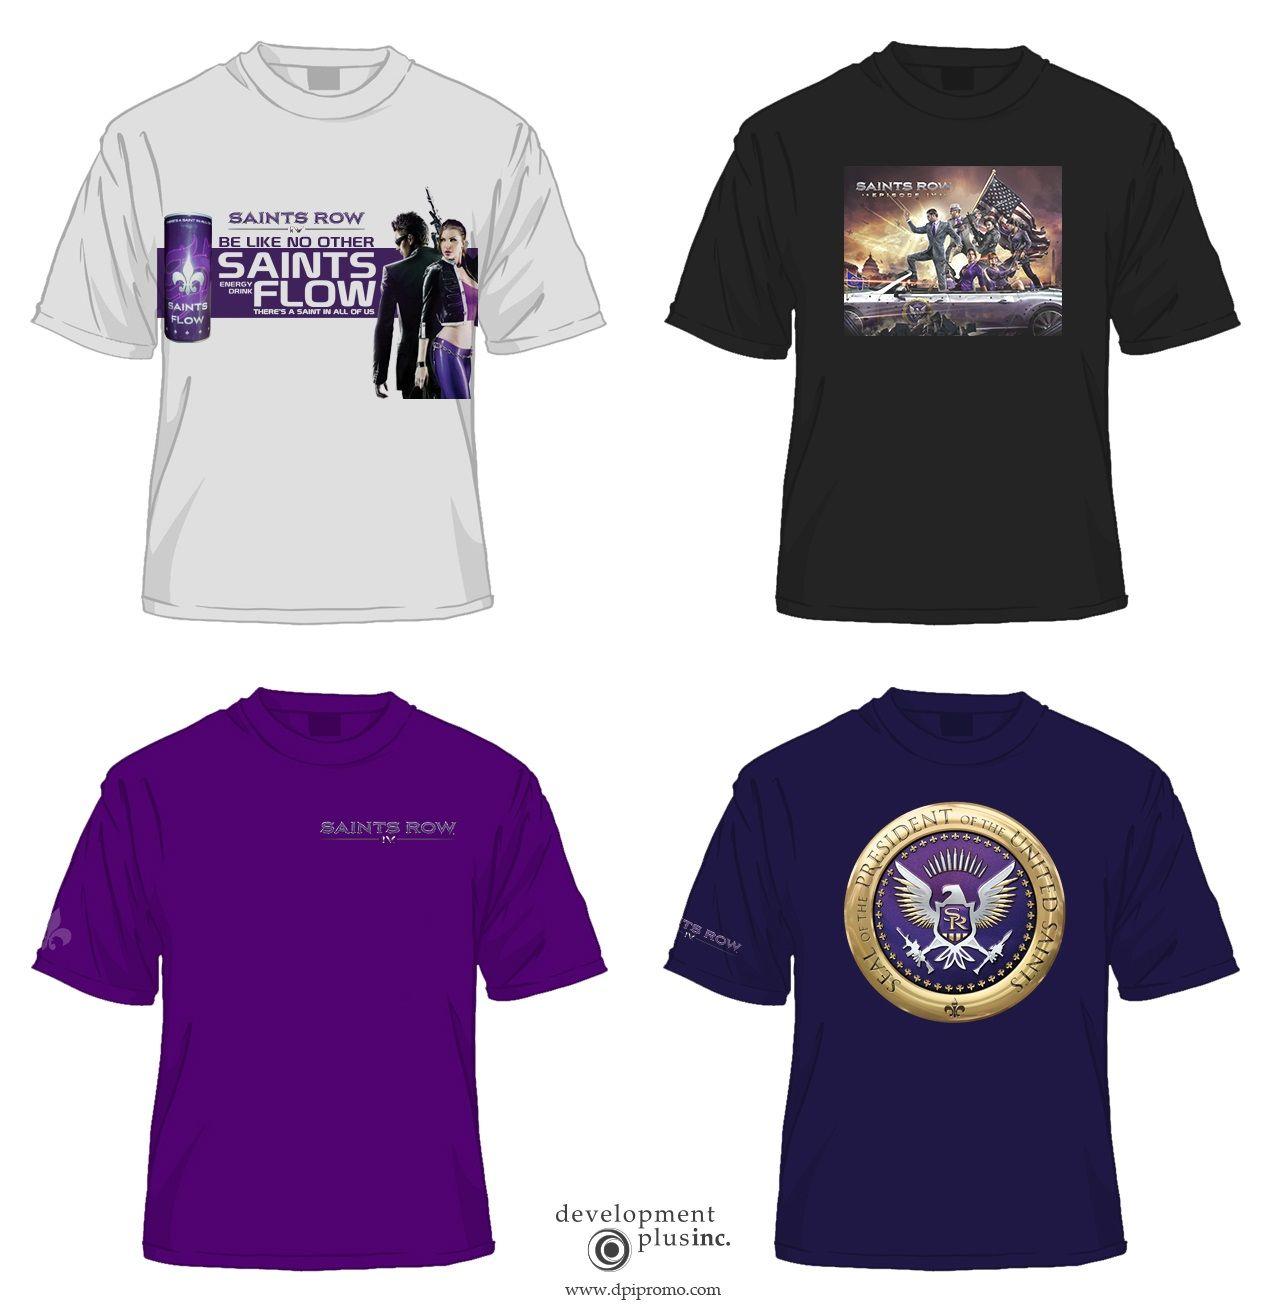 Shirt design concepts - T Shirt Design Concepts For Saints Row Iv Http Dpipromo